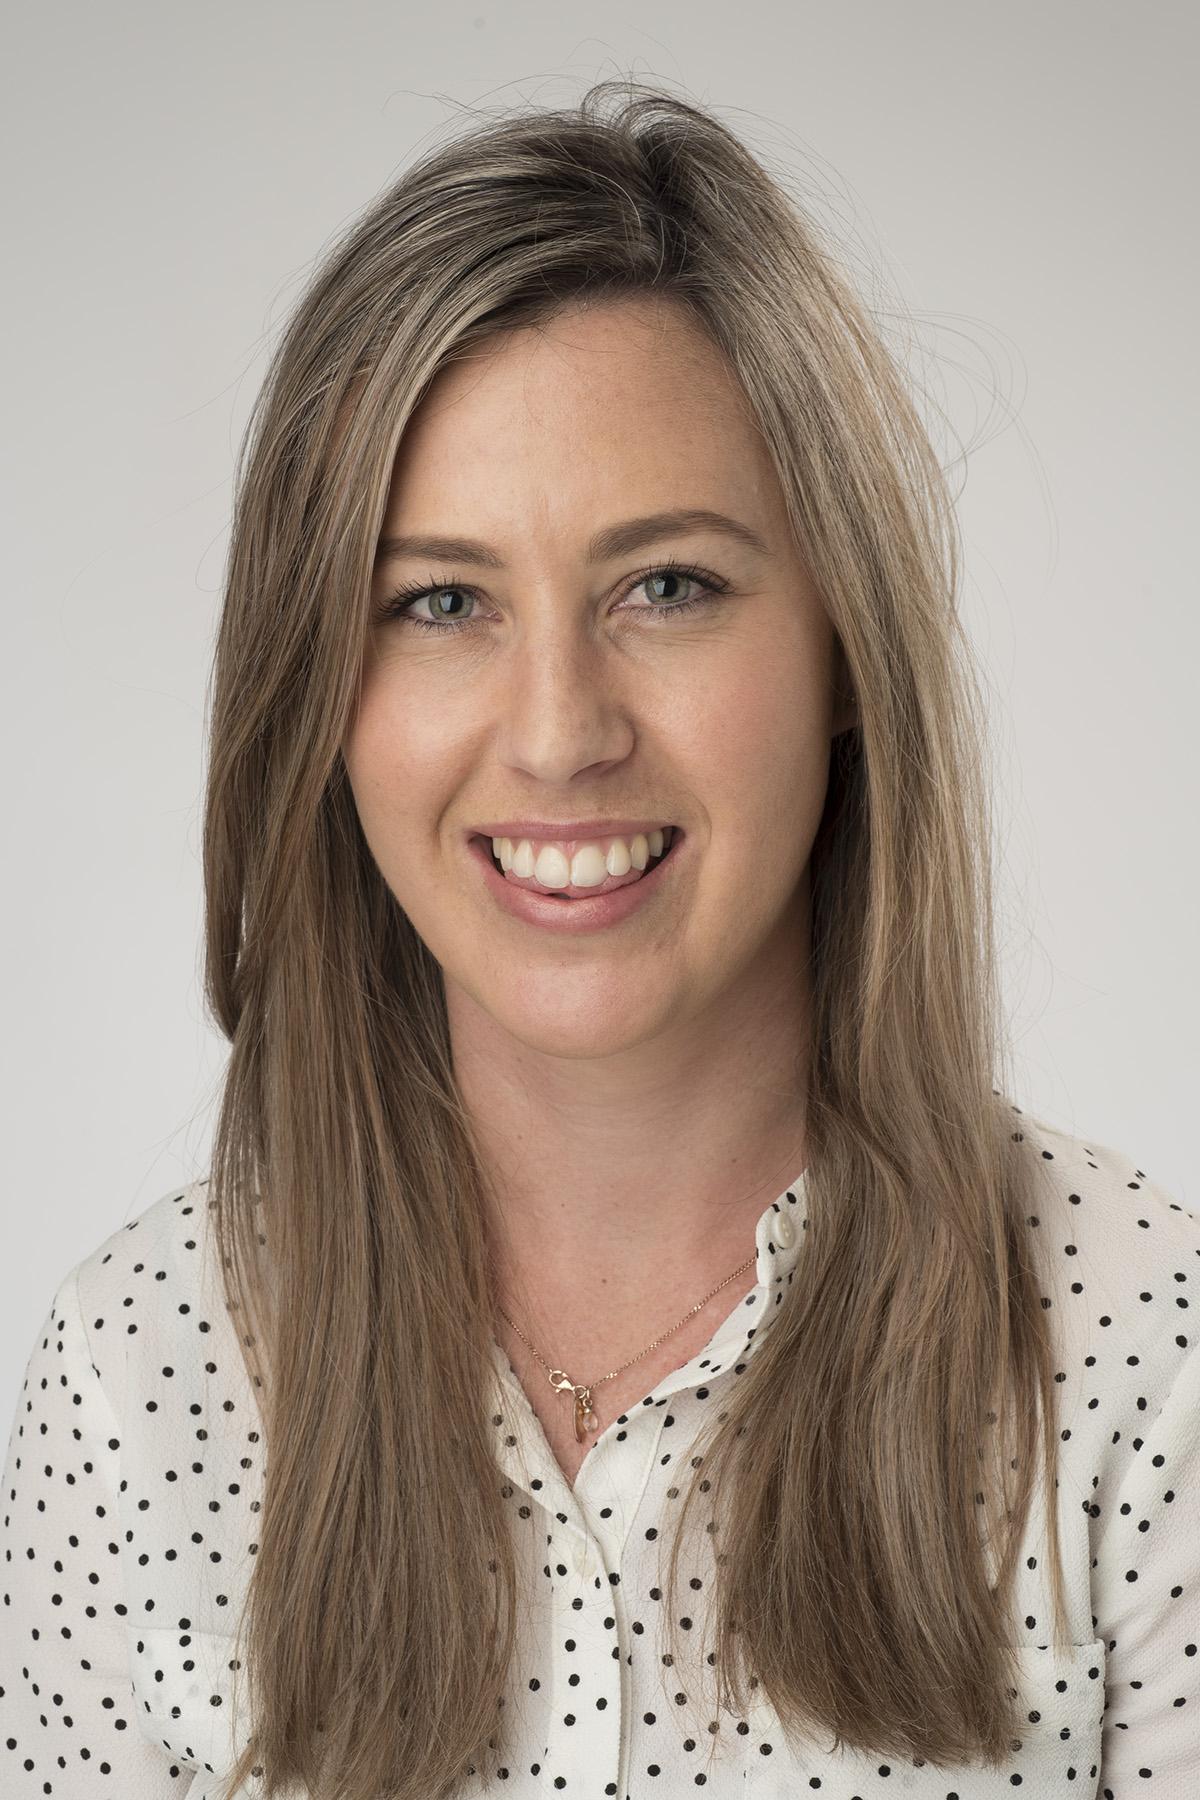 Kate Danna